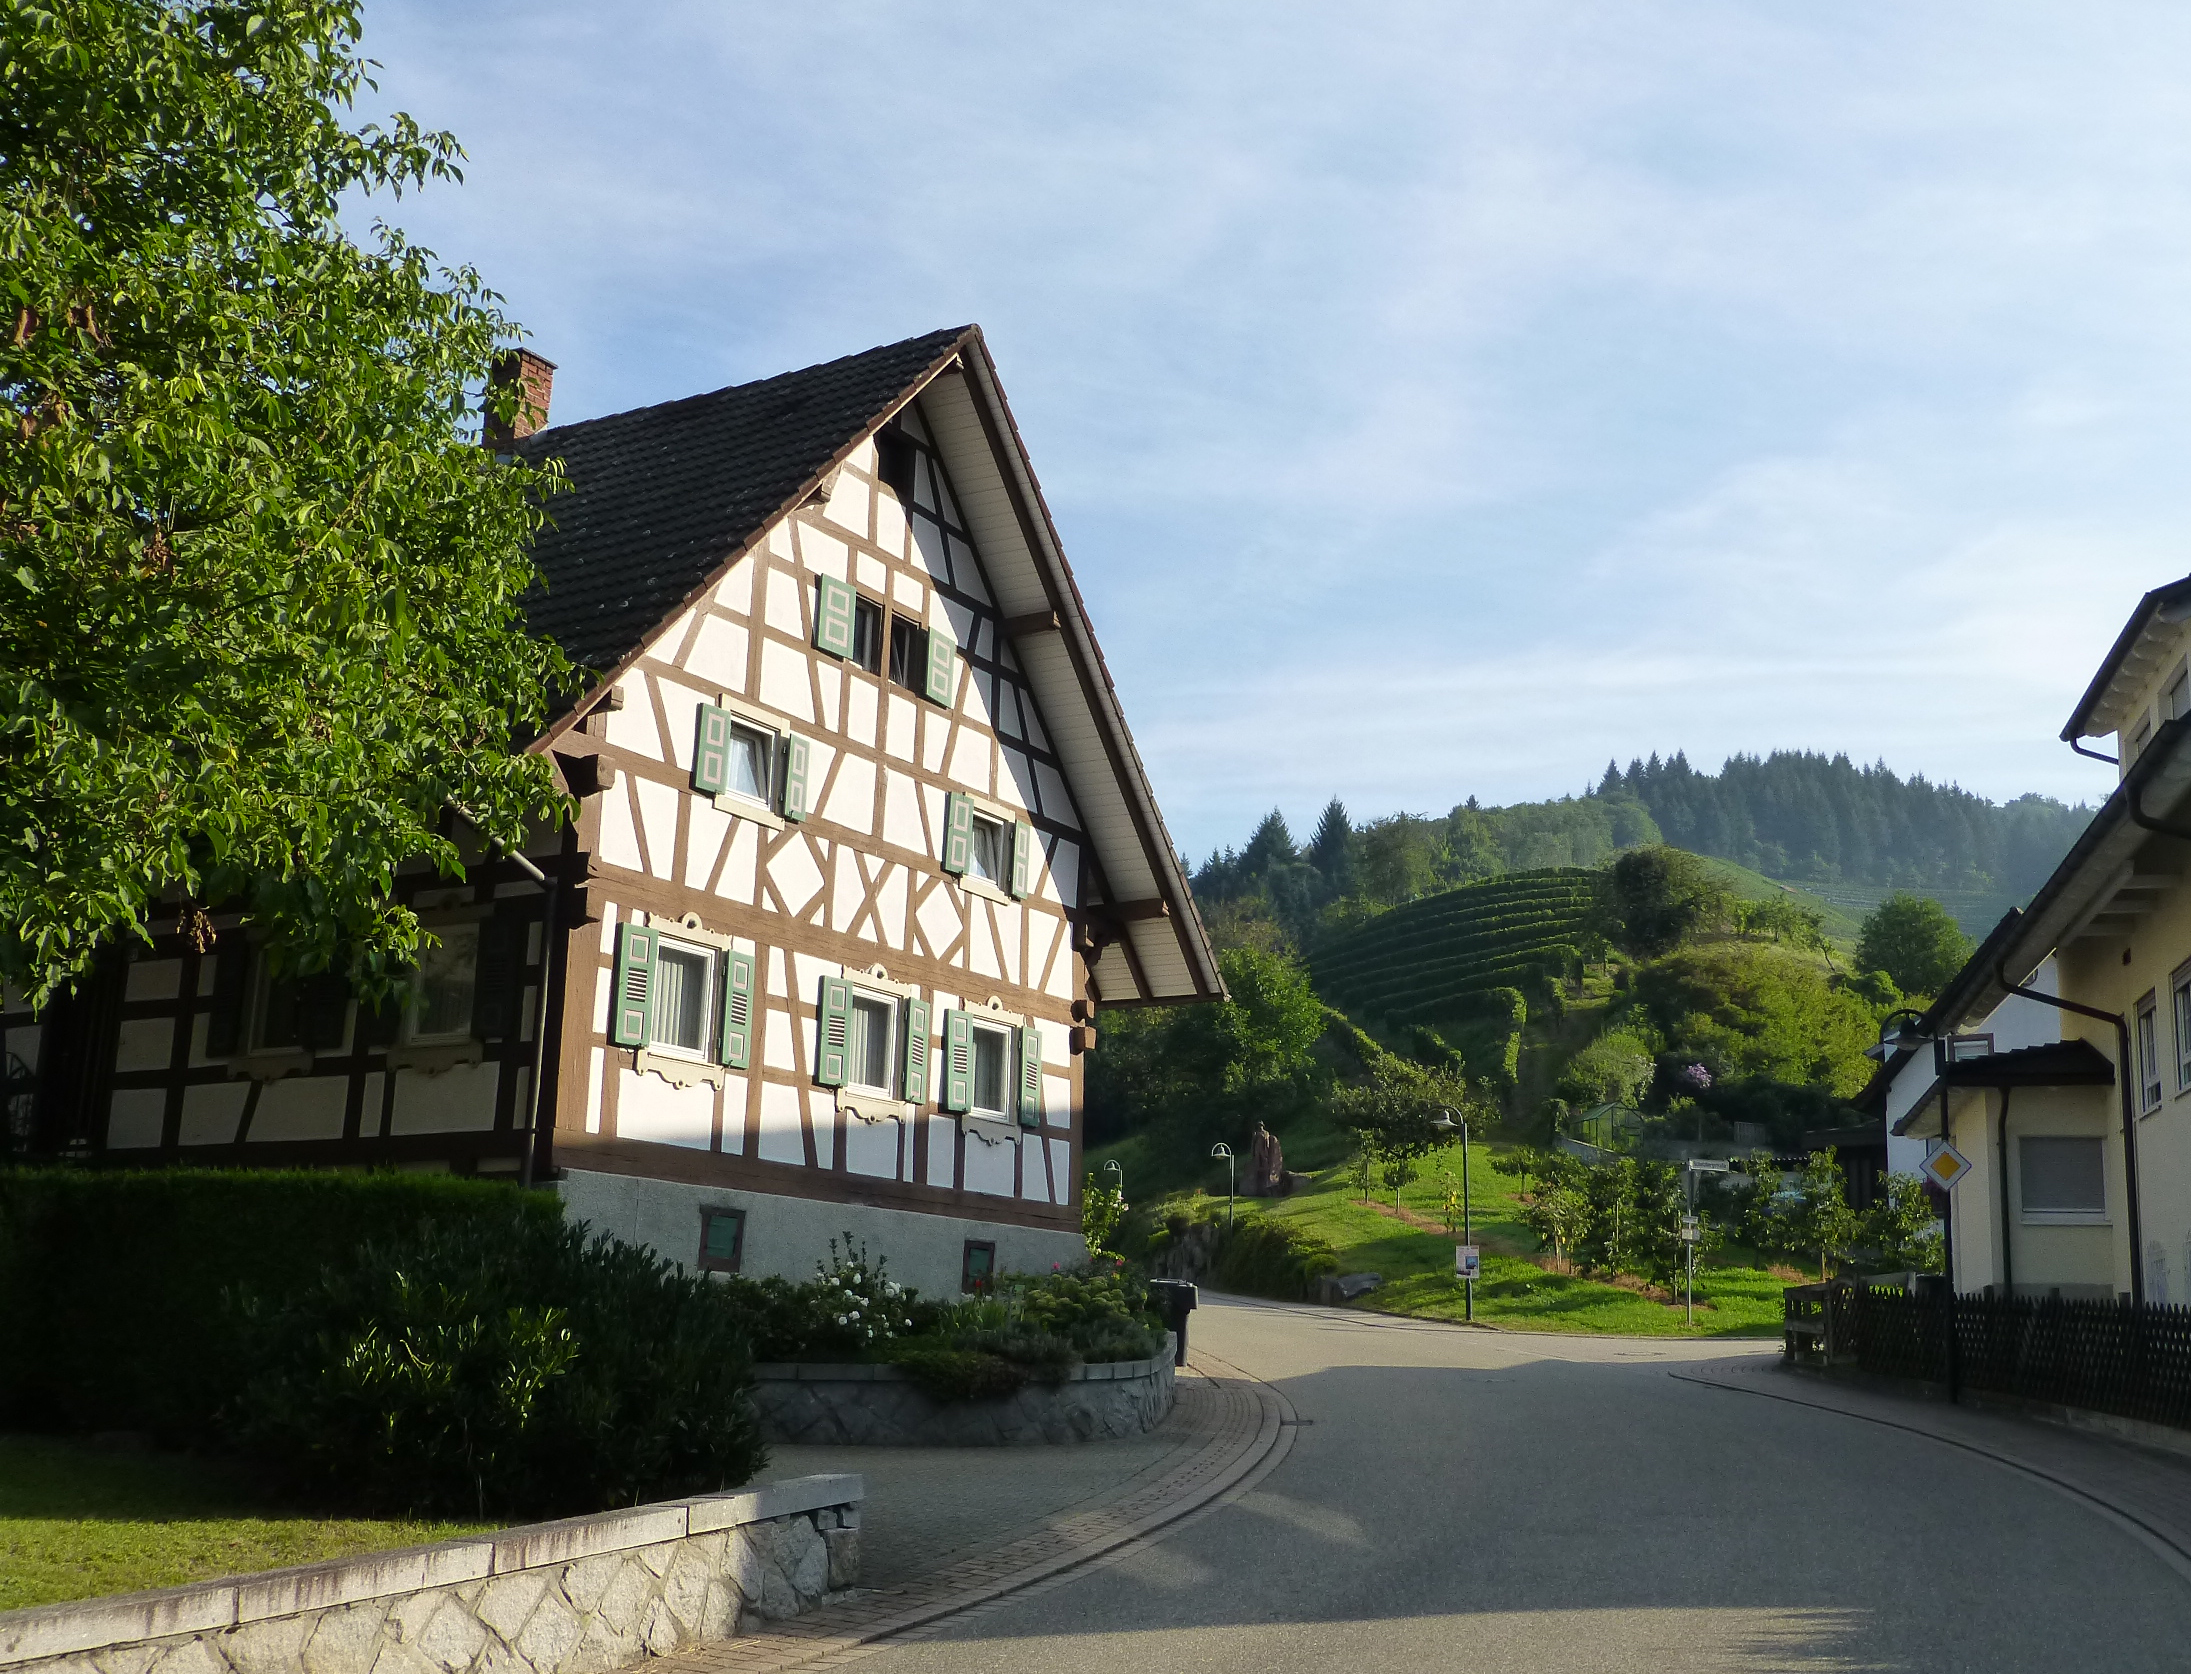 File:Ringelbach Timber framing 019.jpg - Wikimedia Commons